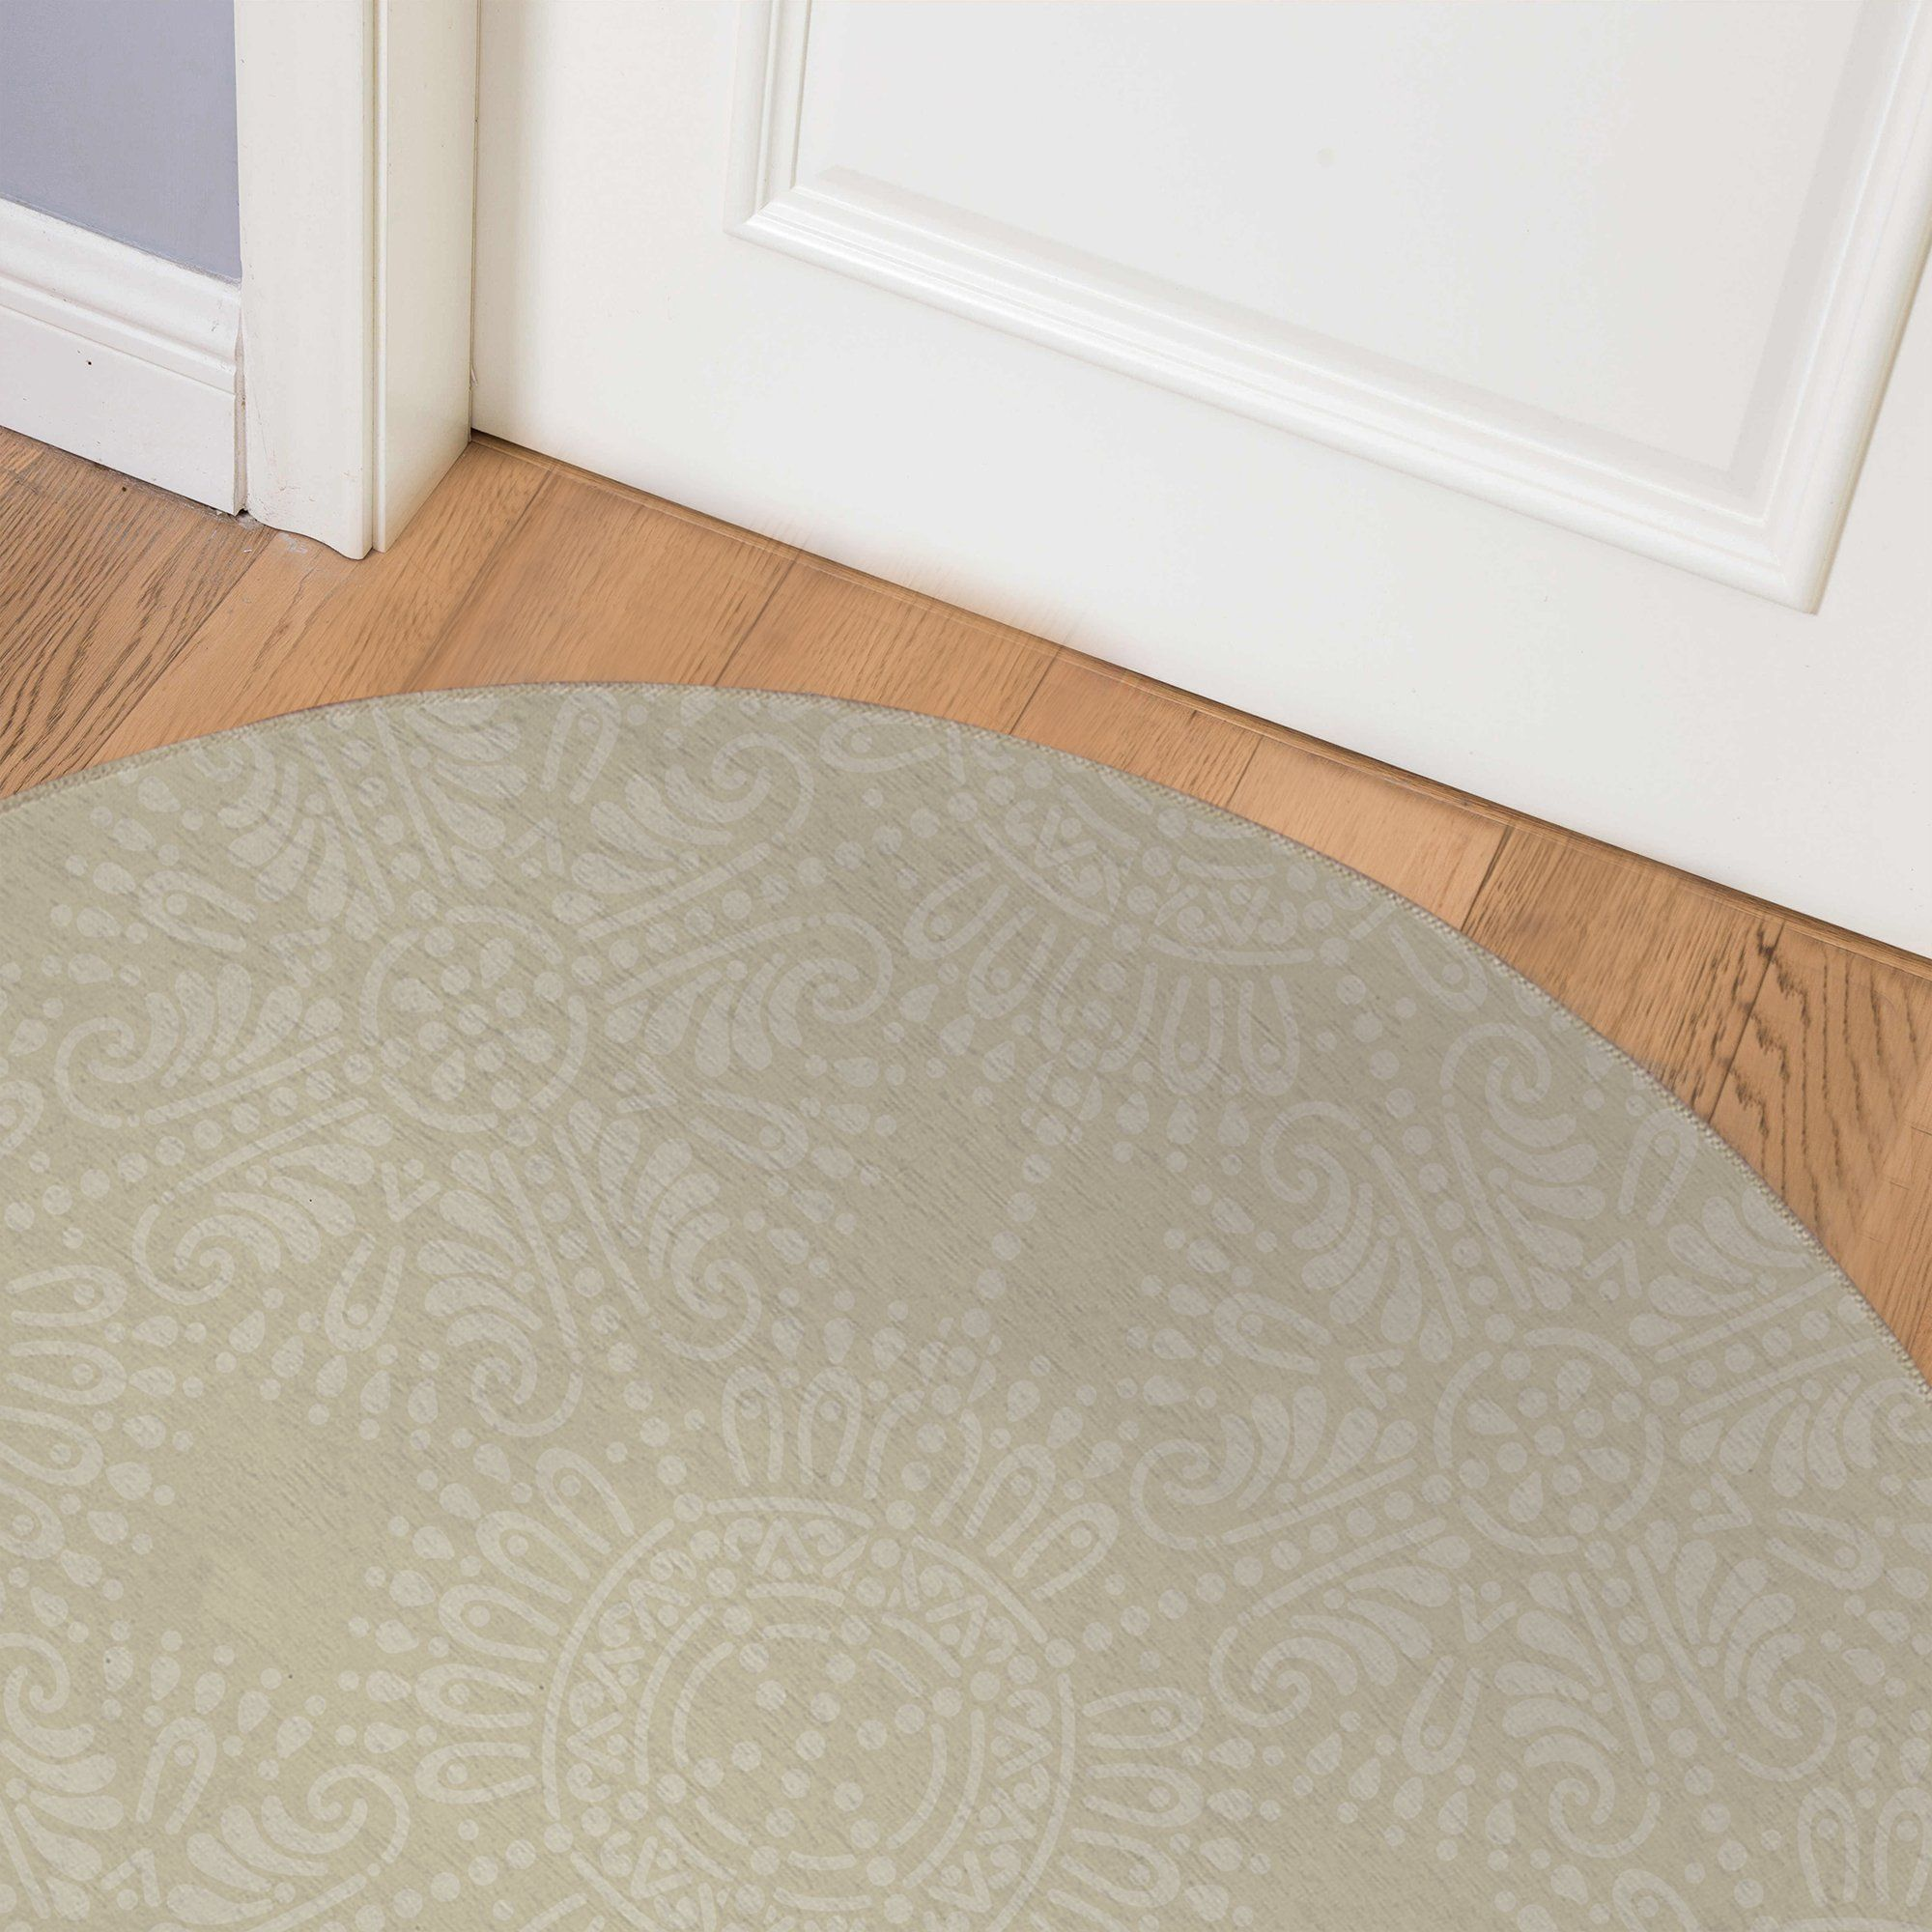 MEDALLION PATTERN NATURAL Indoor Floor Mat By Kavka Designs - Round 5ft x 5ft